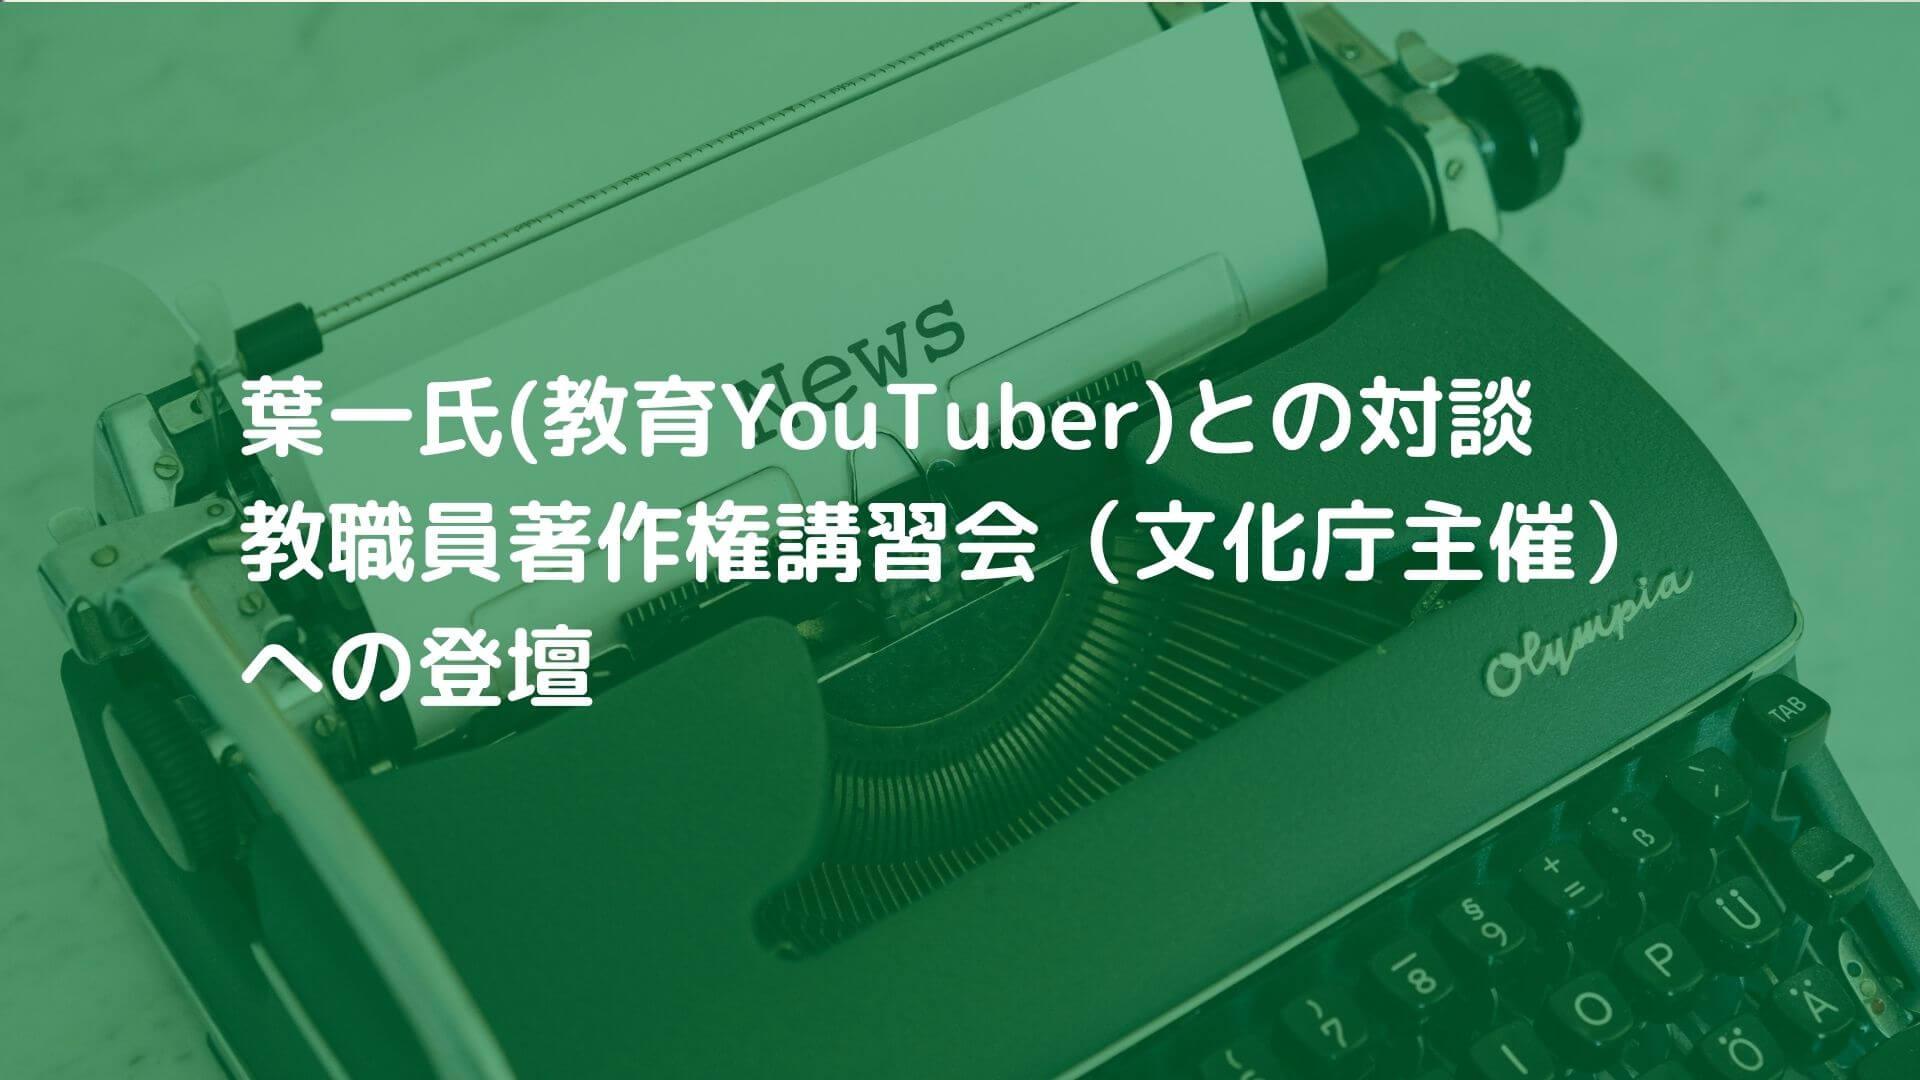 【報告】葉一氏(教育YouTuber)との対談・教職員著作権講習会(文化庁主催)への登壇(8月)